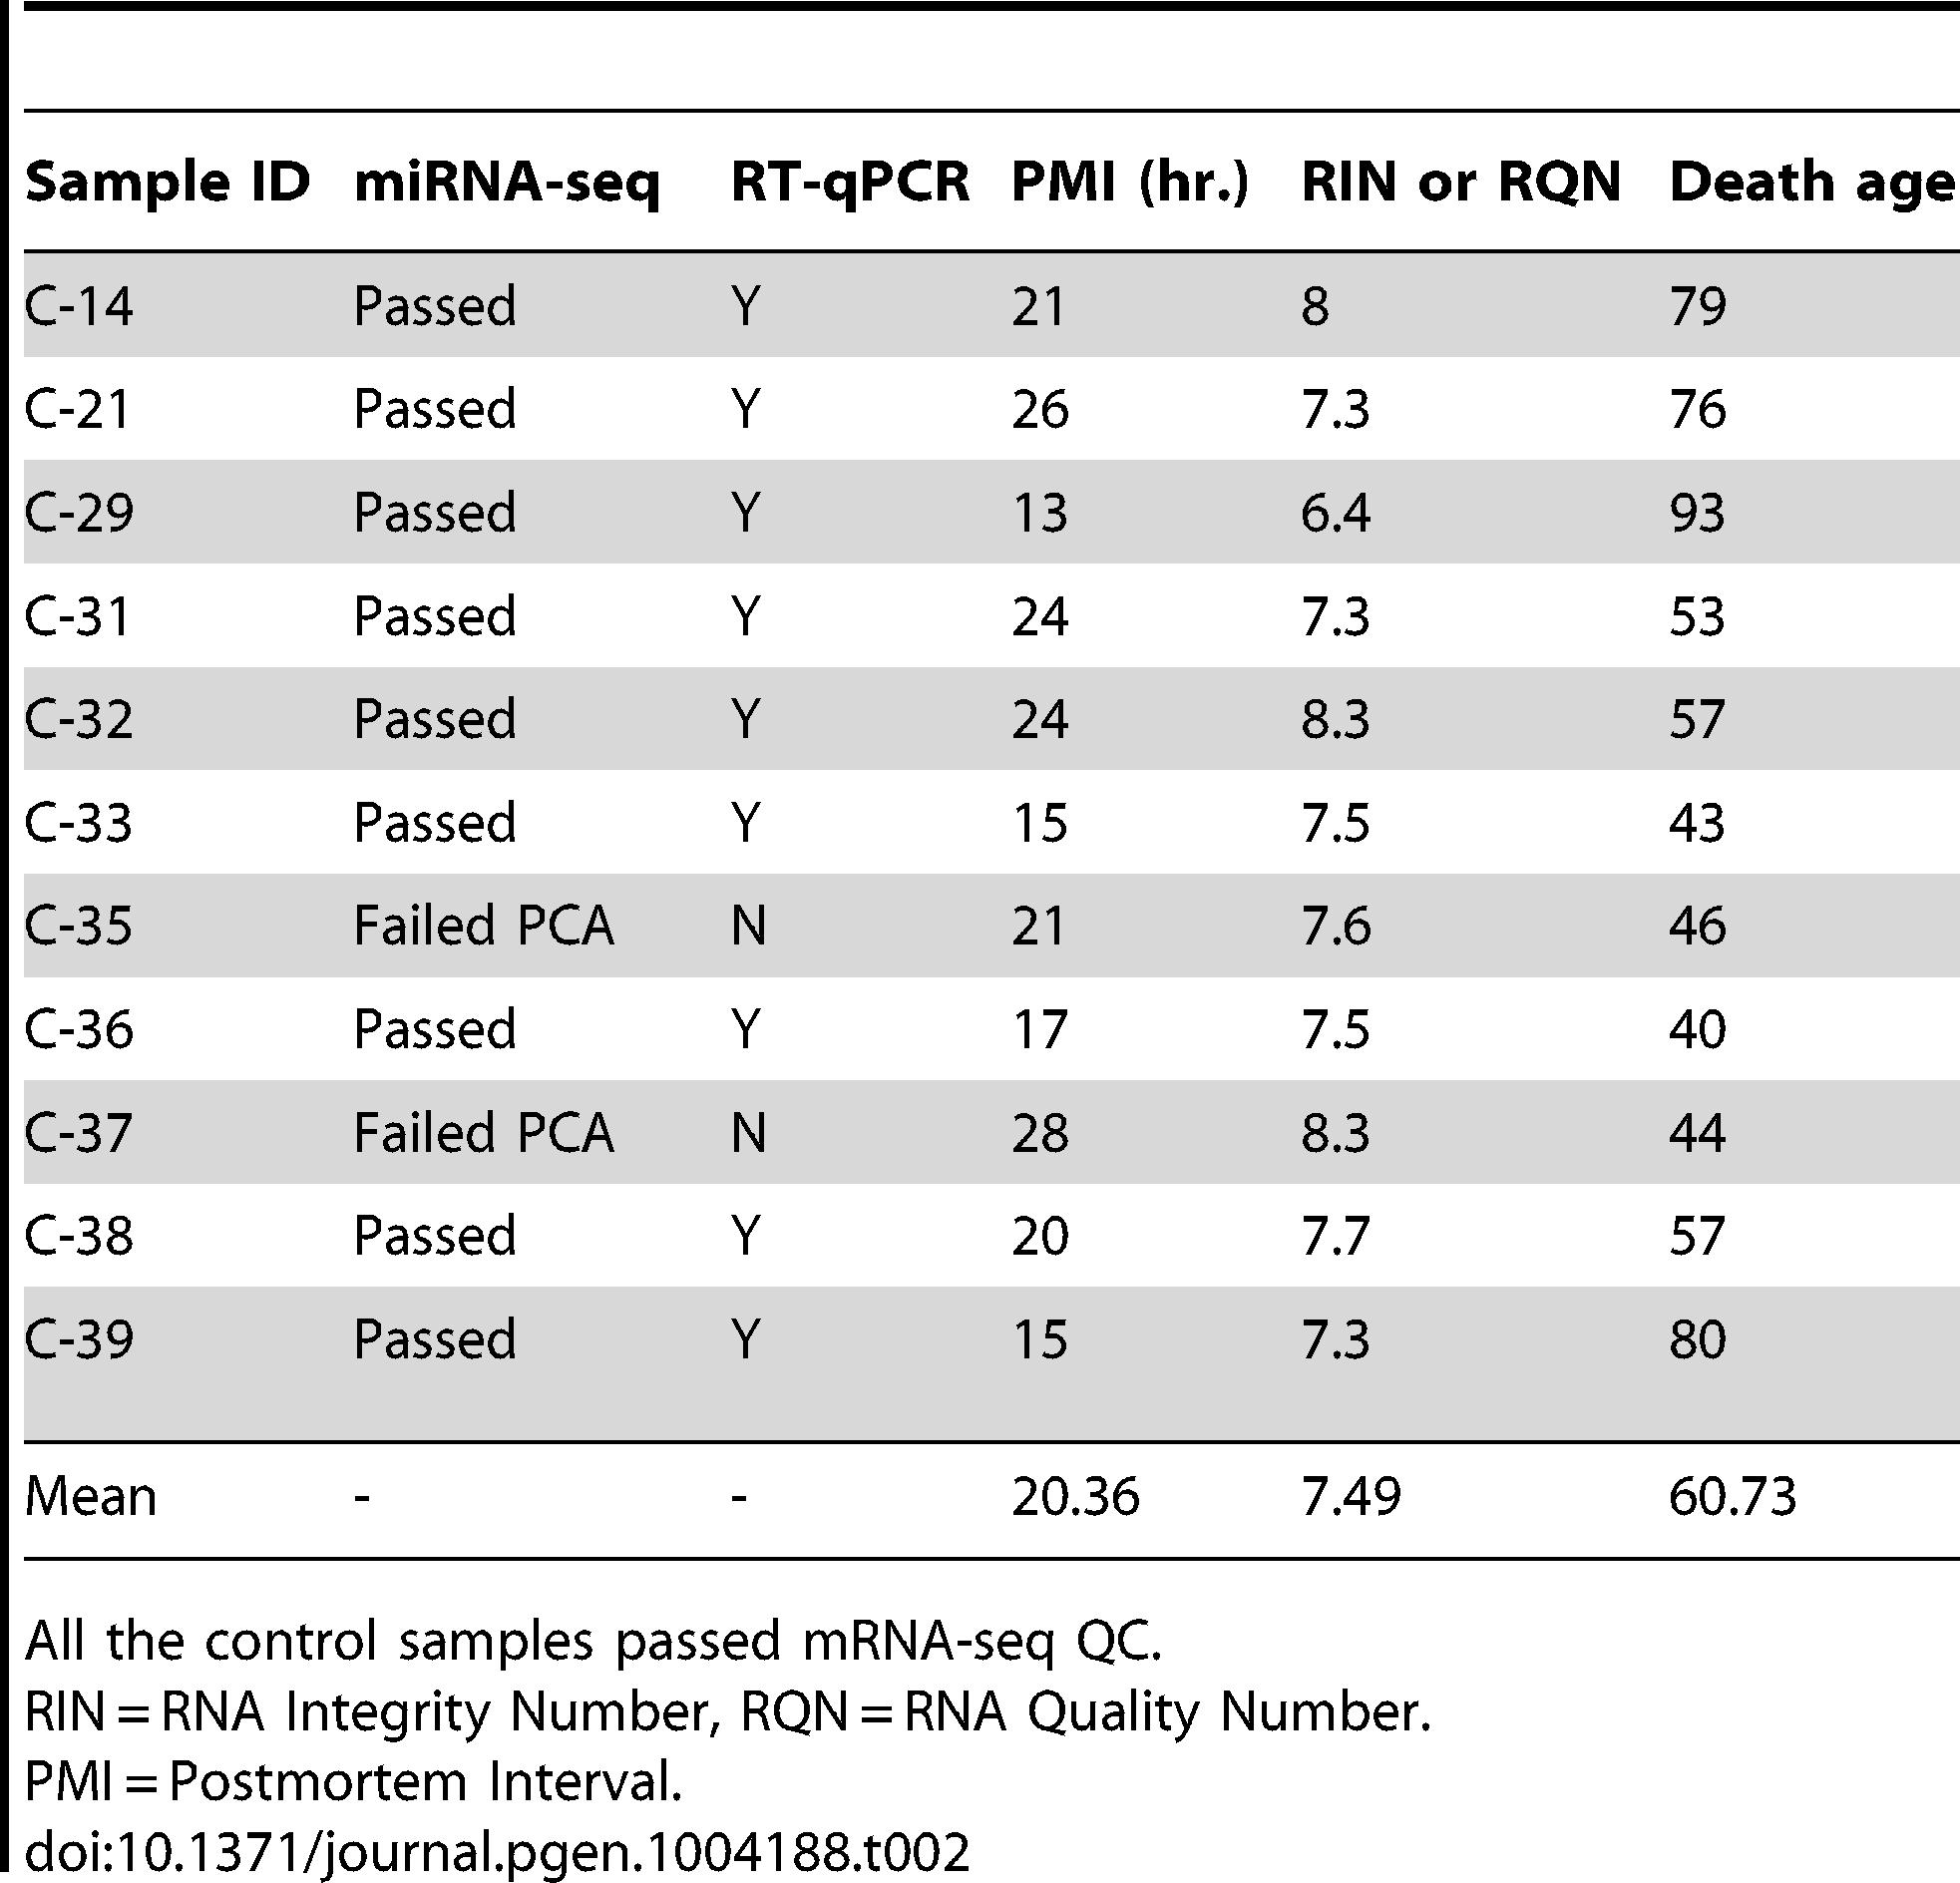 Control brain samples analyzed for mRNA-seq, miRNA-seq and RT-qPCR validation of miR-10b-5p.